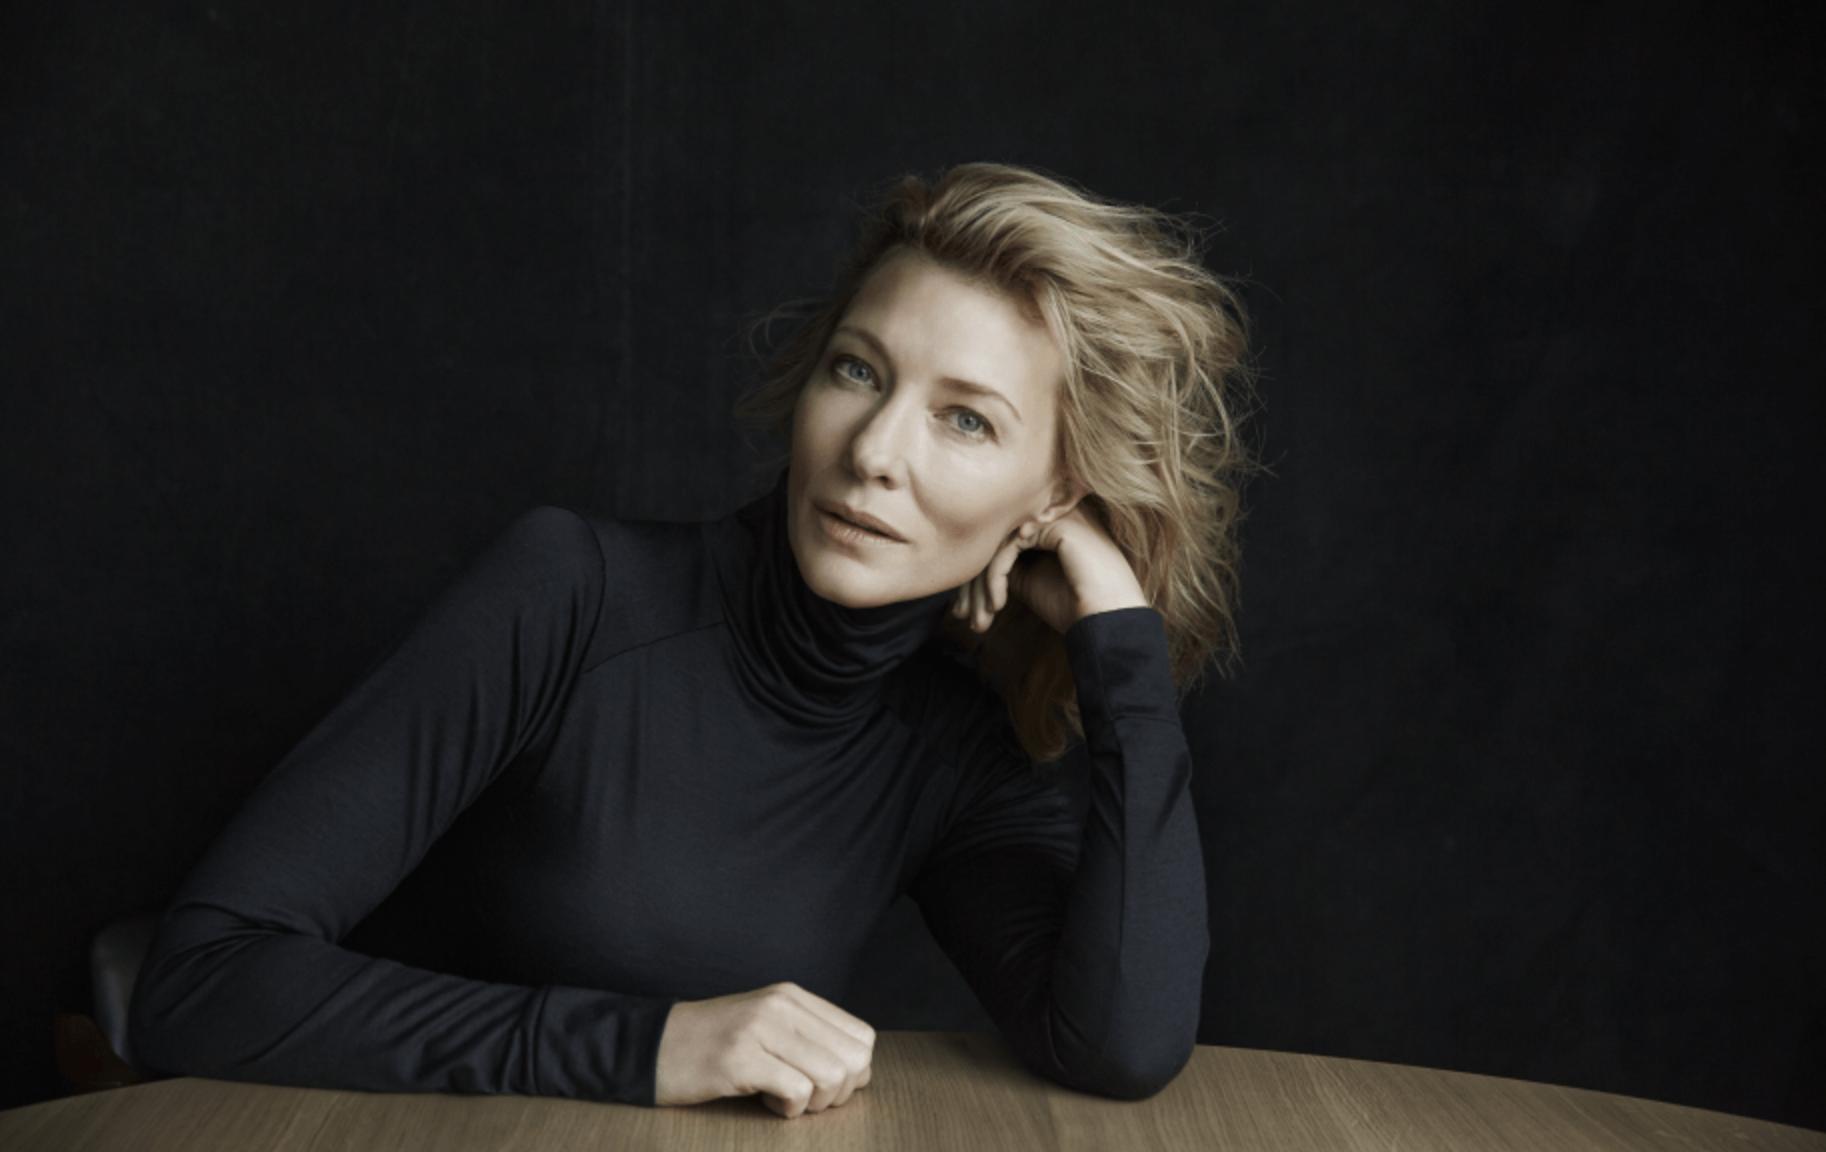 Cate Blanchett presidirá júri do Festival de Cannes de 2018